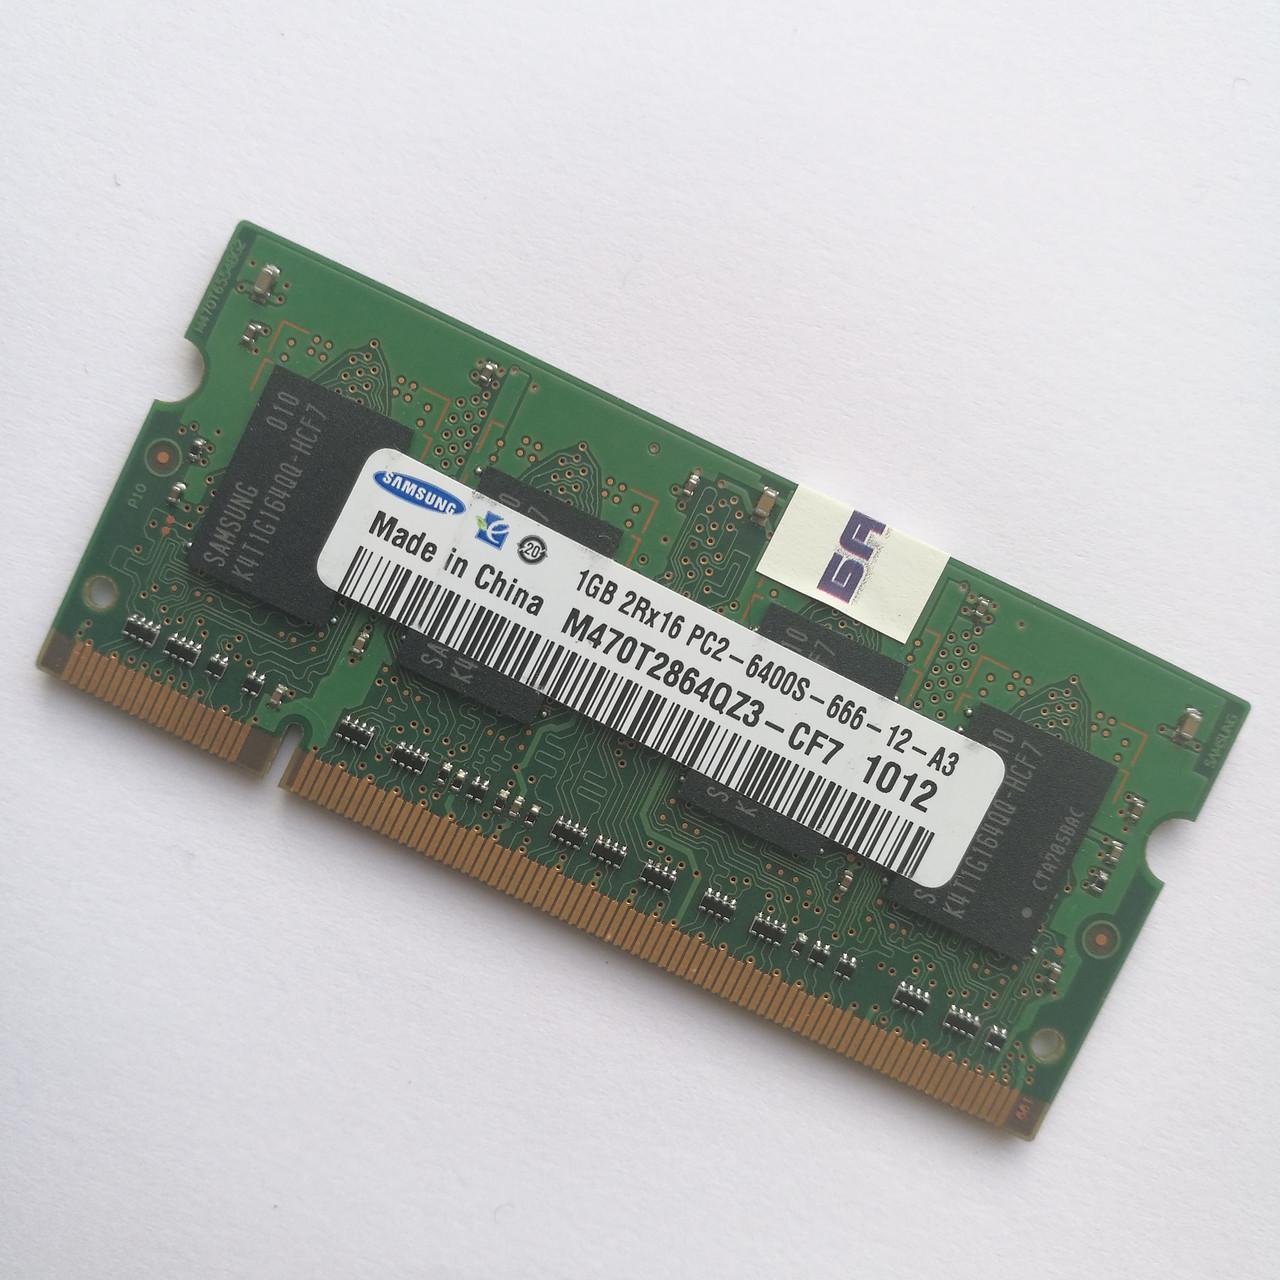 Оперативная память для ноутбука Samsung SODIMM DDR2 1Gb 800MHz 6400s CL6 (M470T2864QZ3-CF7) Б/У